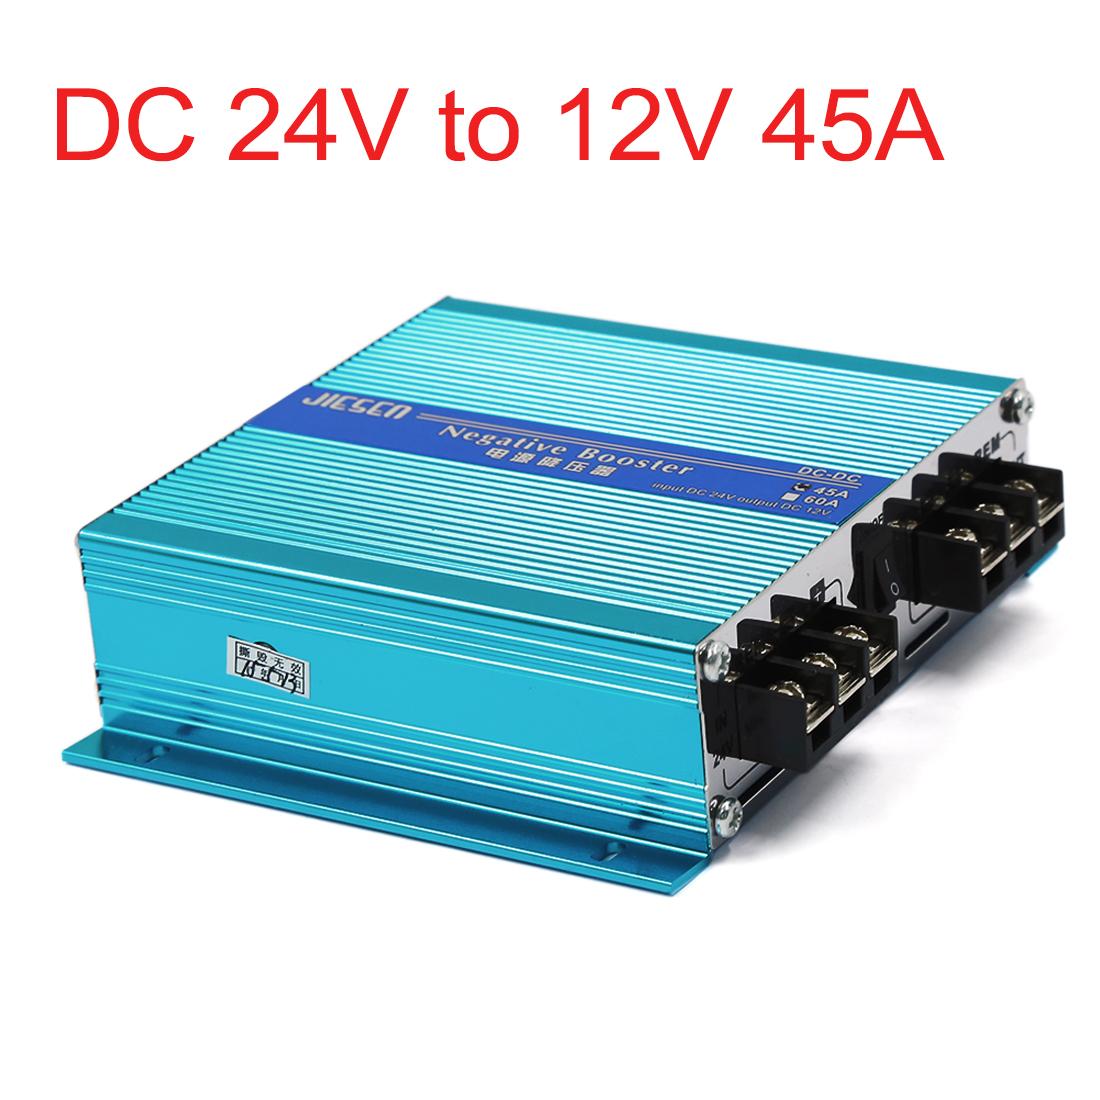 Car DC 24V to 12V 45A Power Supply Transformer Converter 142mm x 12mm x 36mm